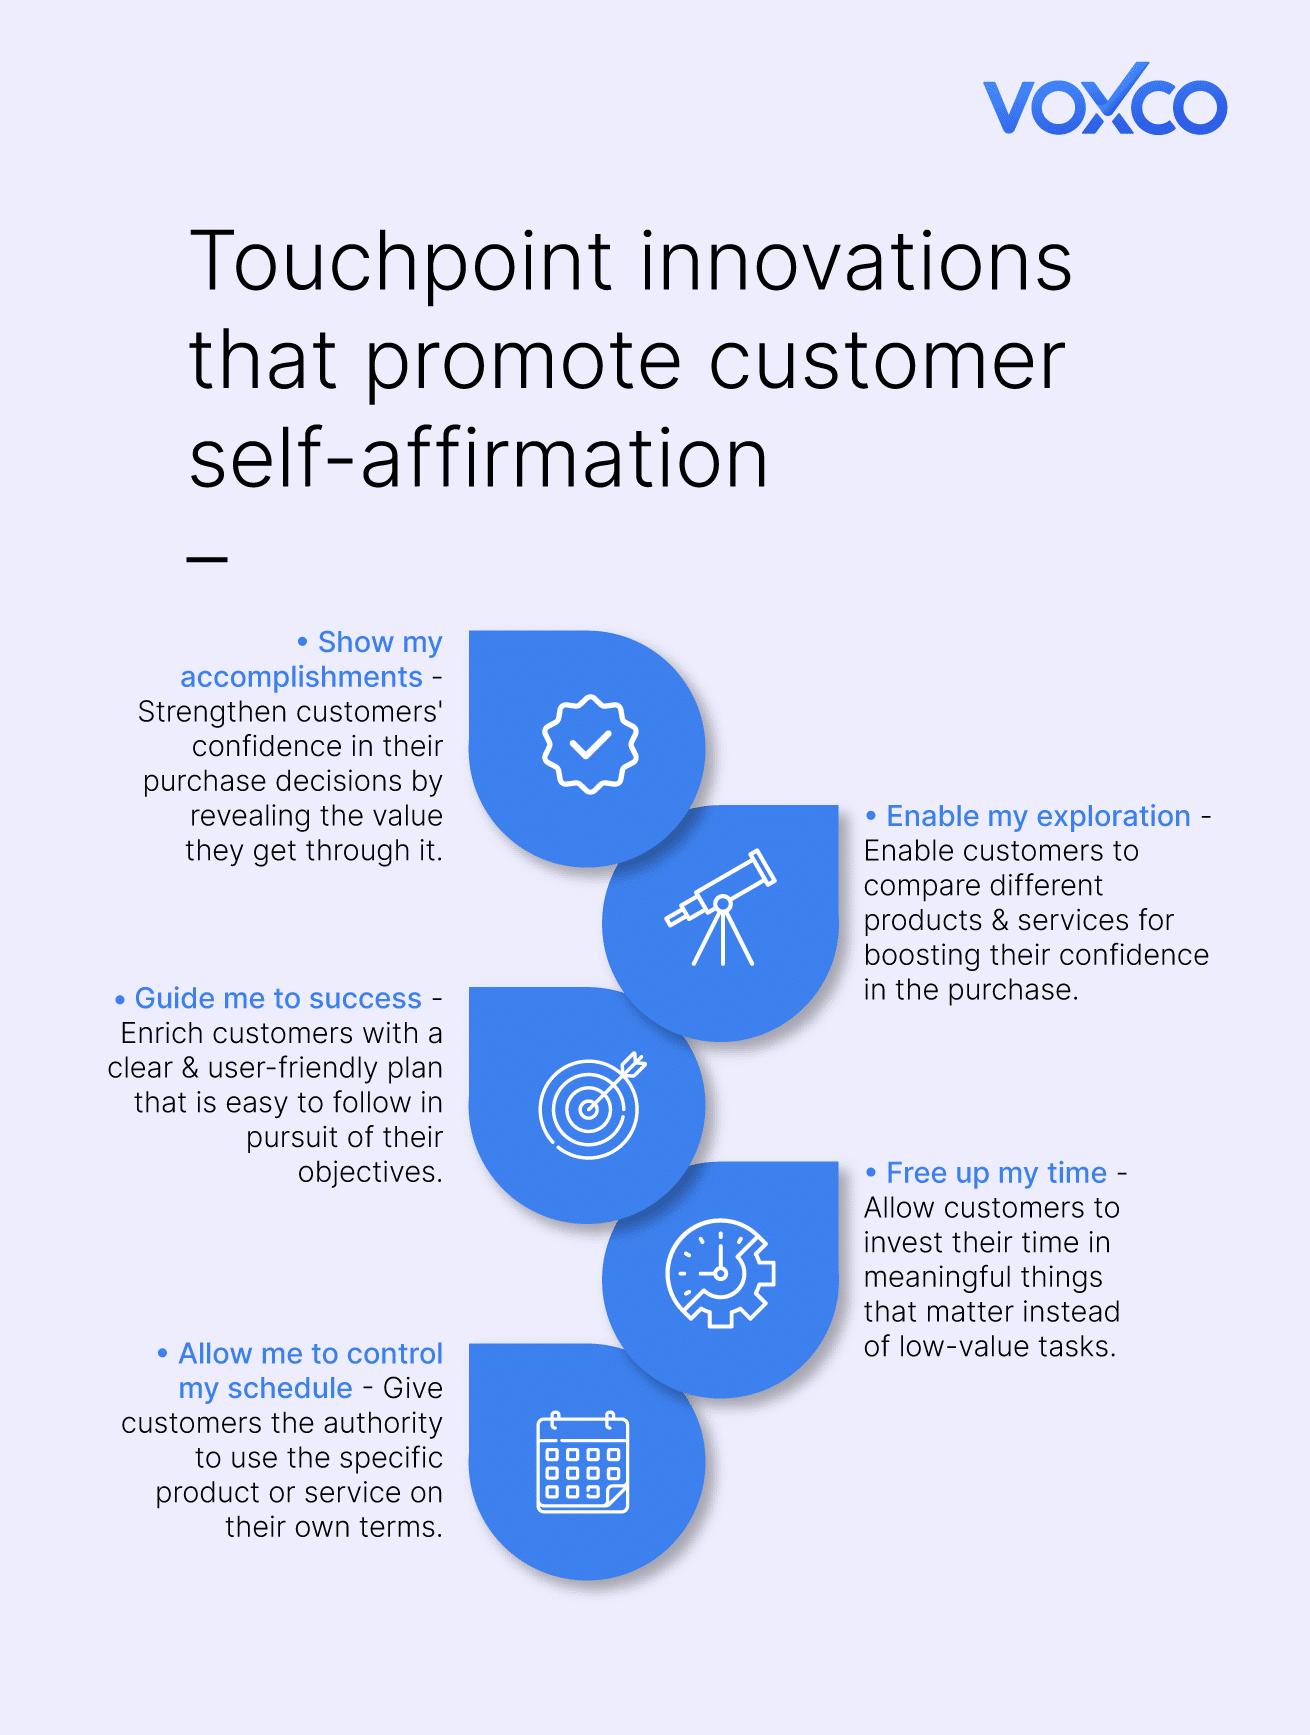 Promoting customer self-affirmation to improve customer loyalty